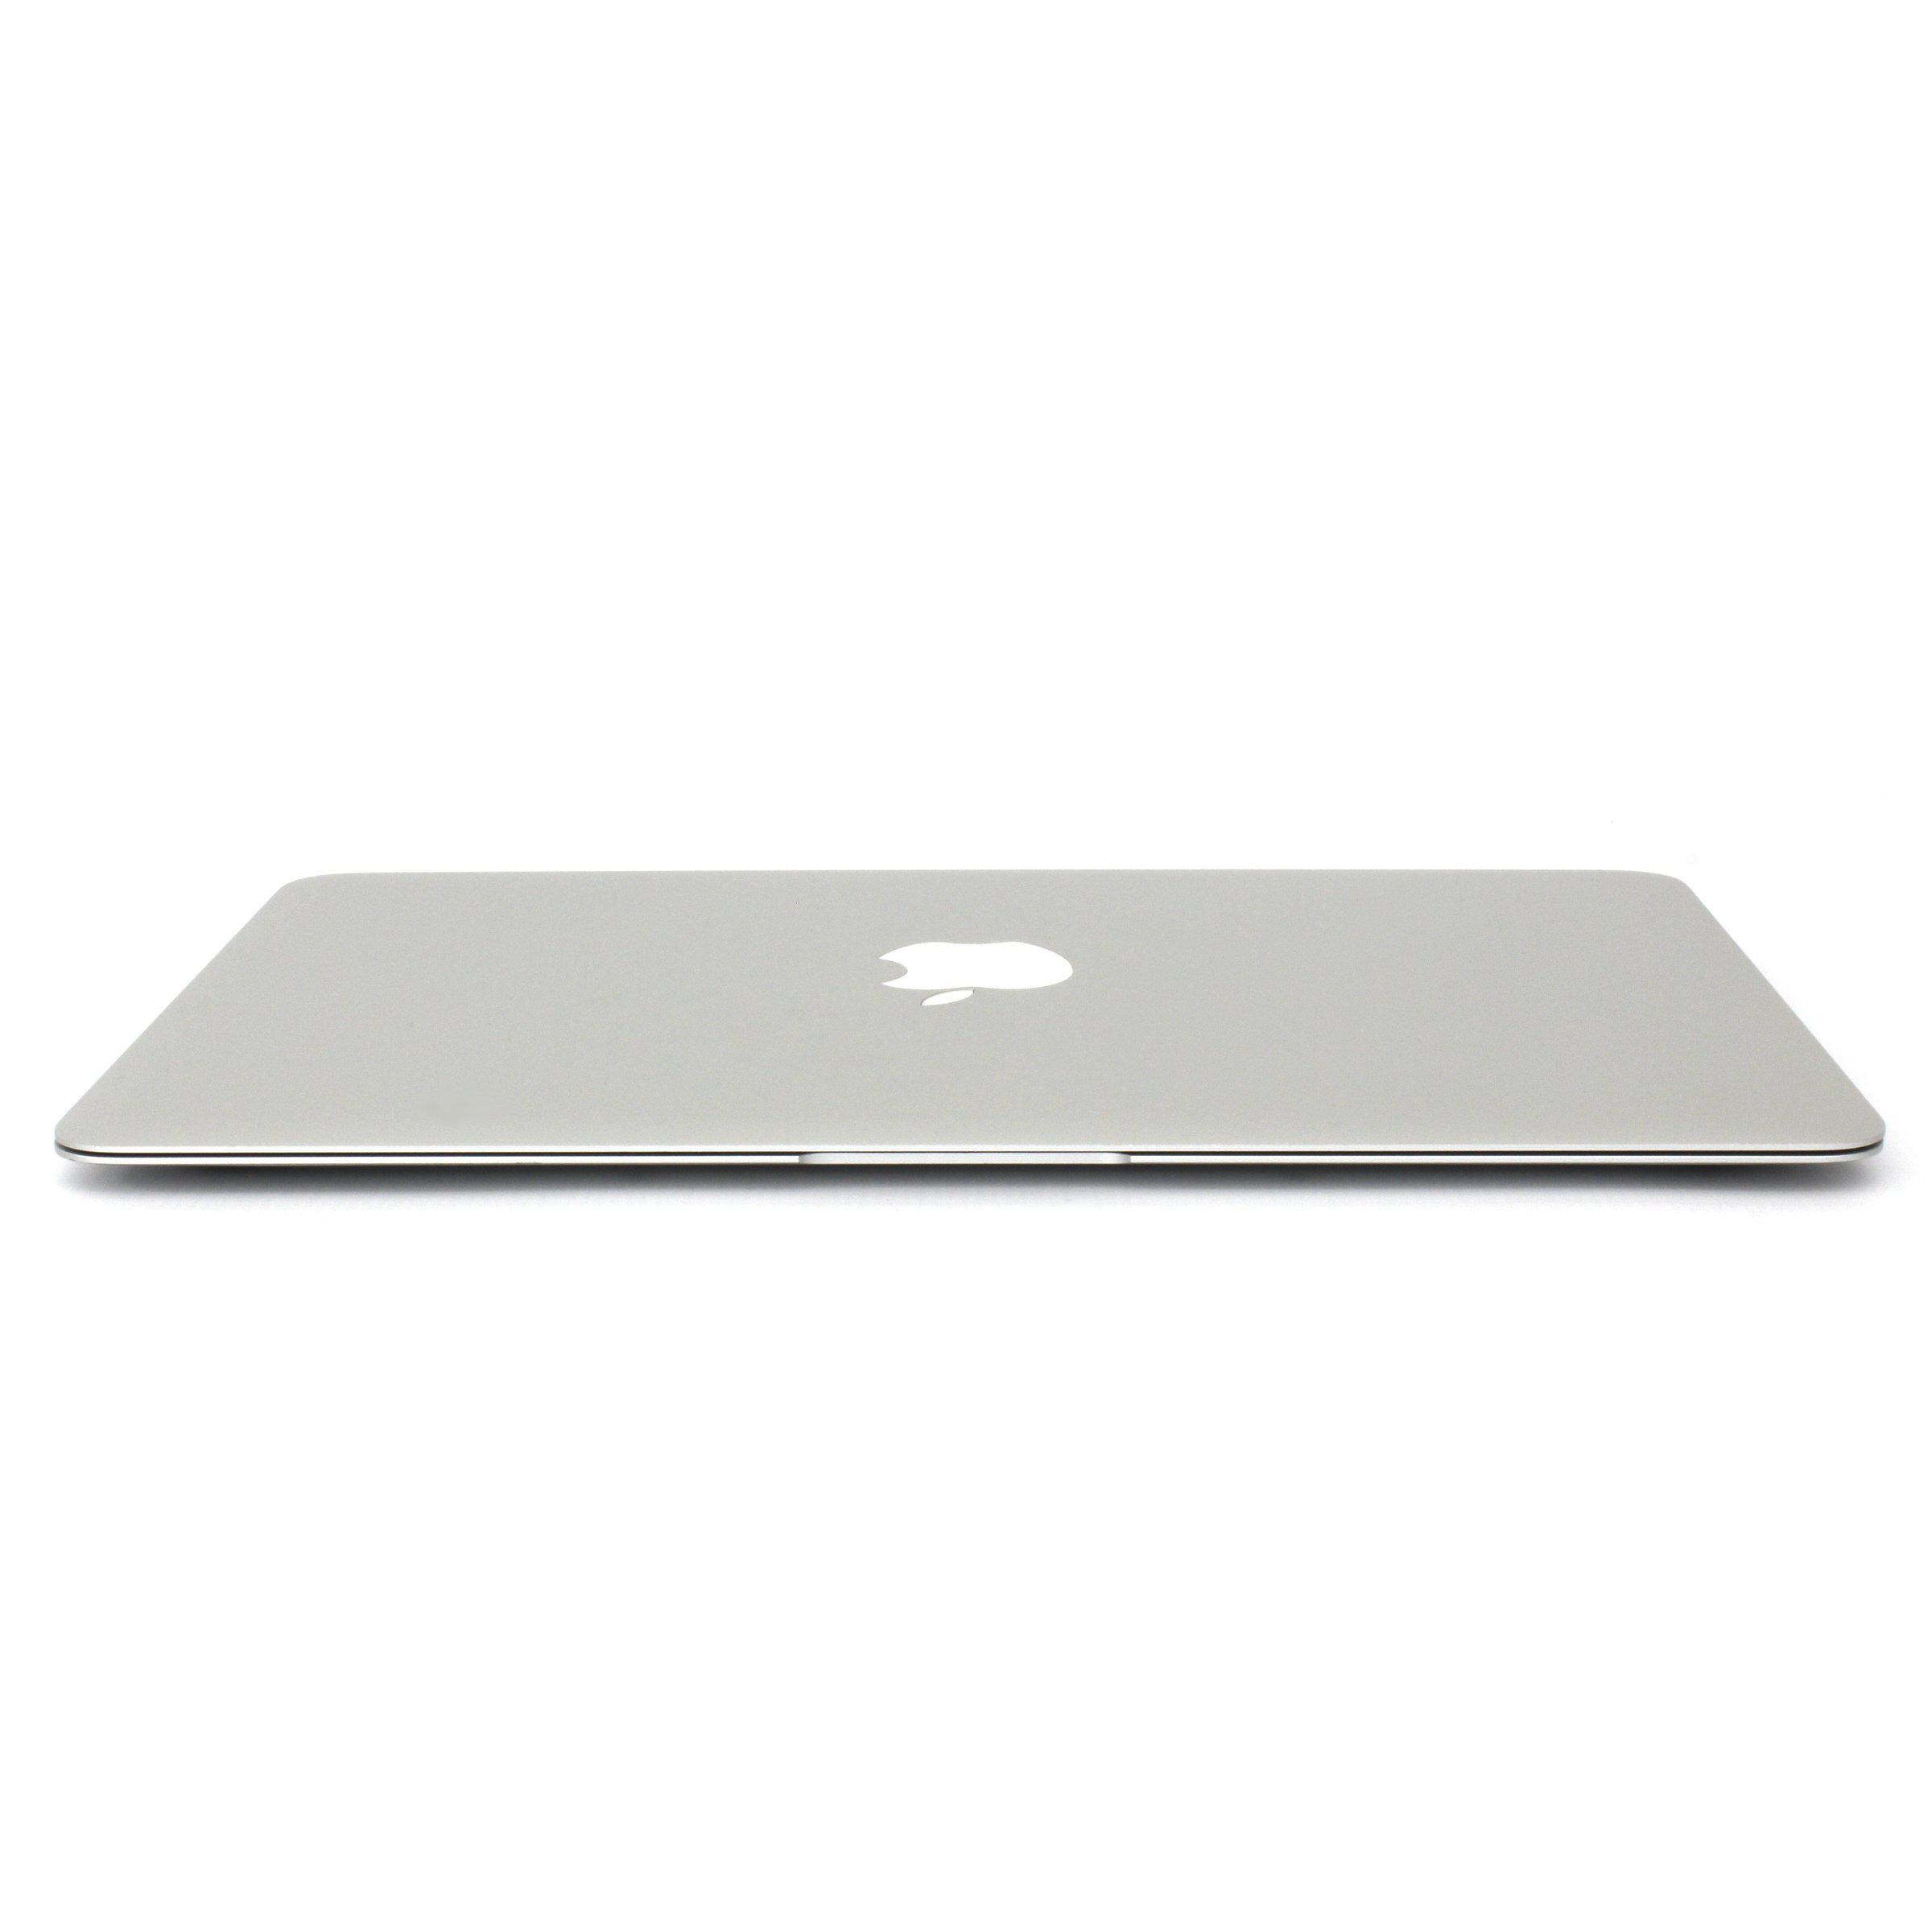 "MacBook Air 11,6"" (2012) - Core i5 - 4GB - SSD 128 GB QWERTY - Anglická (US)"